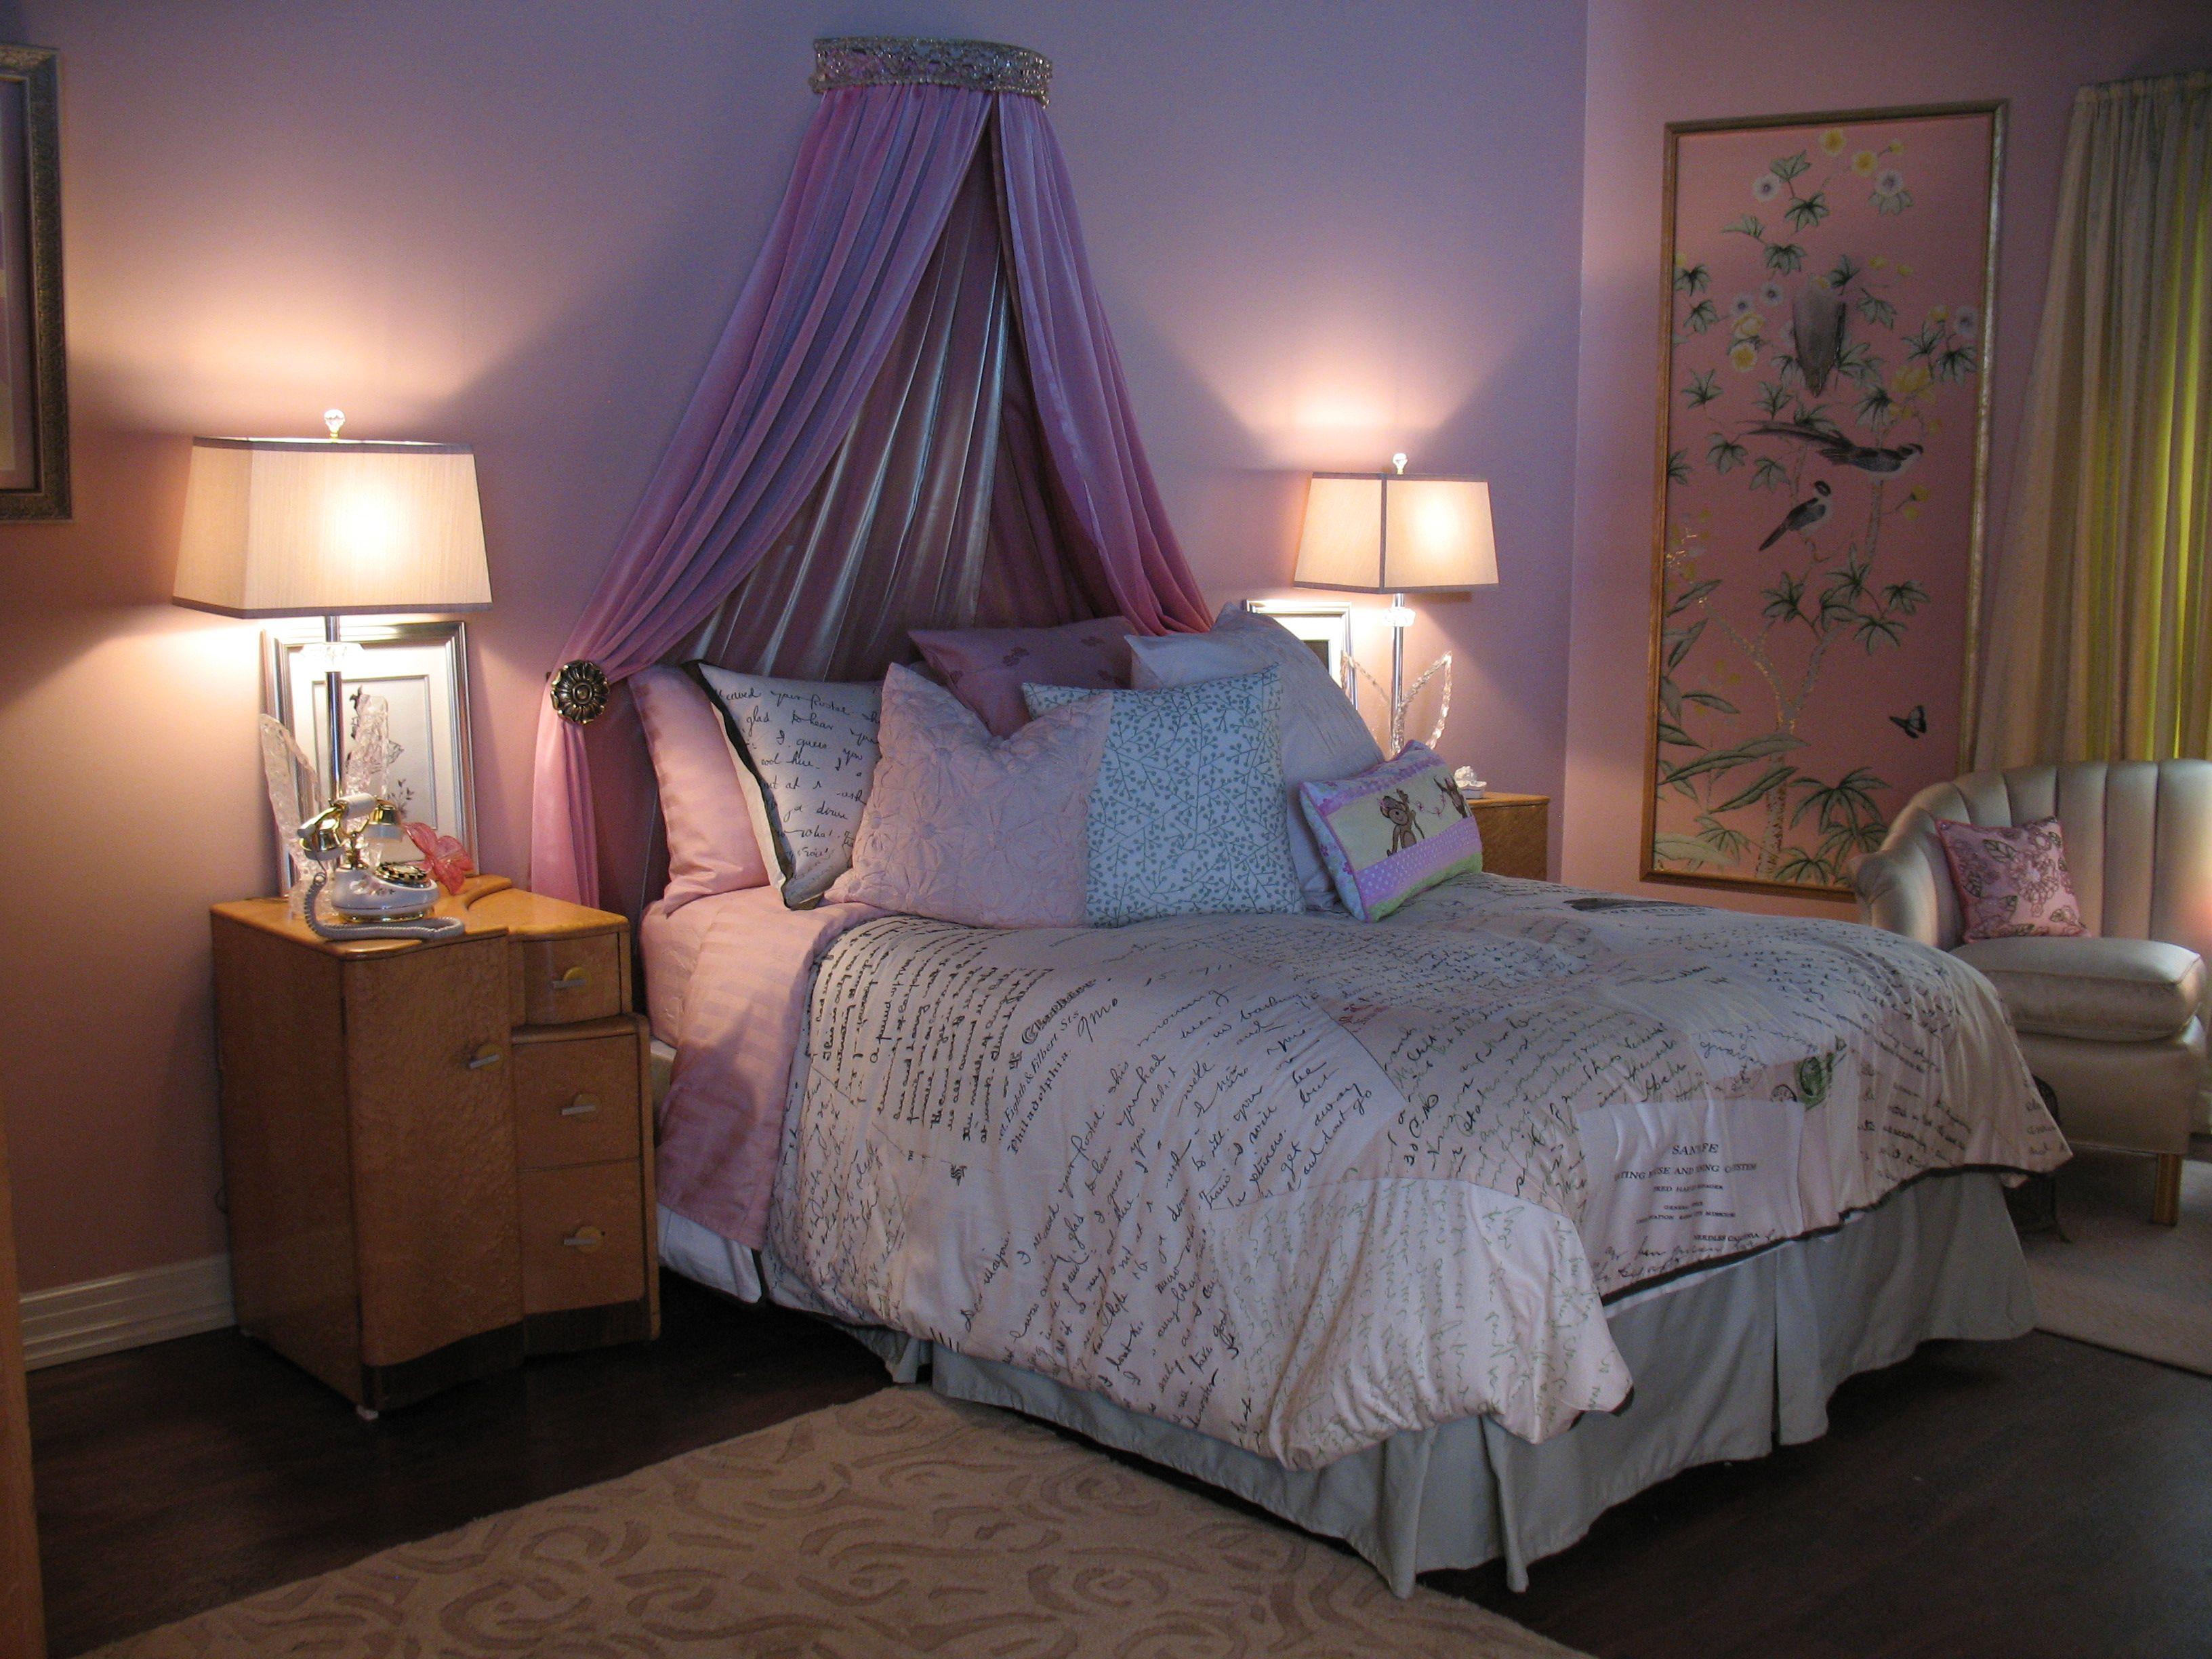 We love ali 39 s bed pretty little liars ali 39 s bedroom pinterest kinderzimmer - Dekotipps schlafzimmer ...